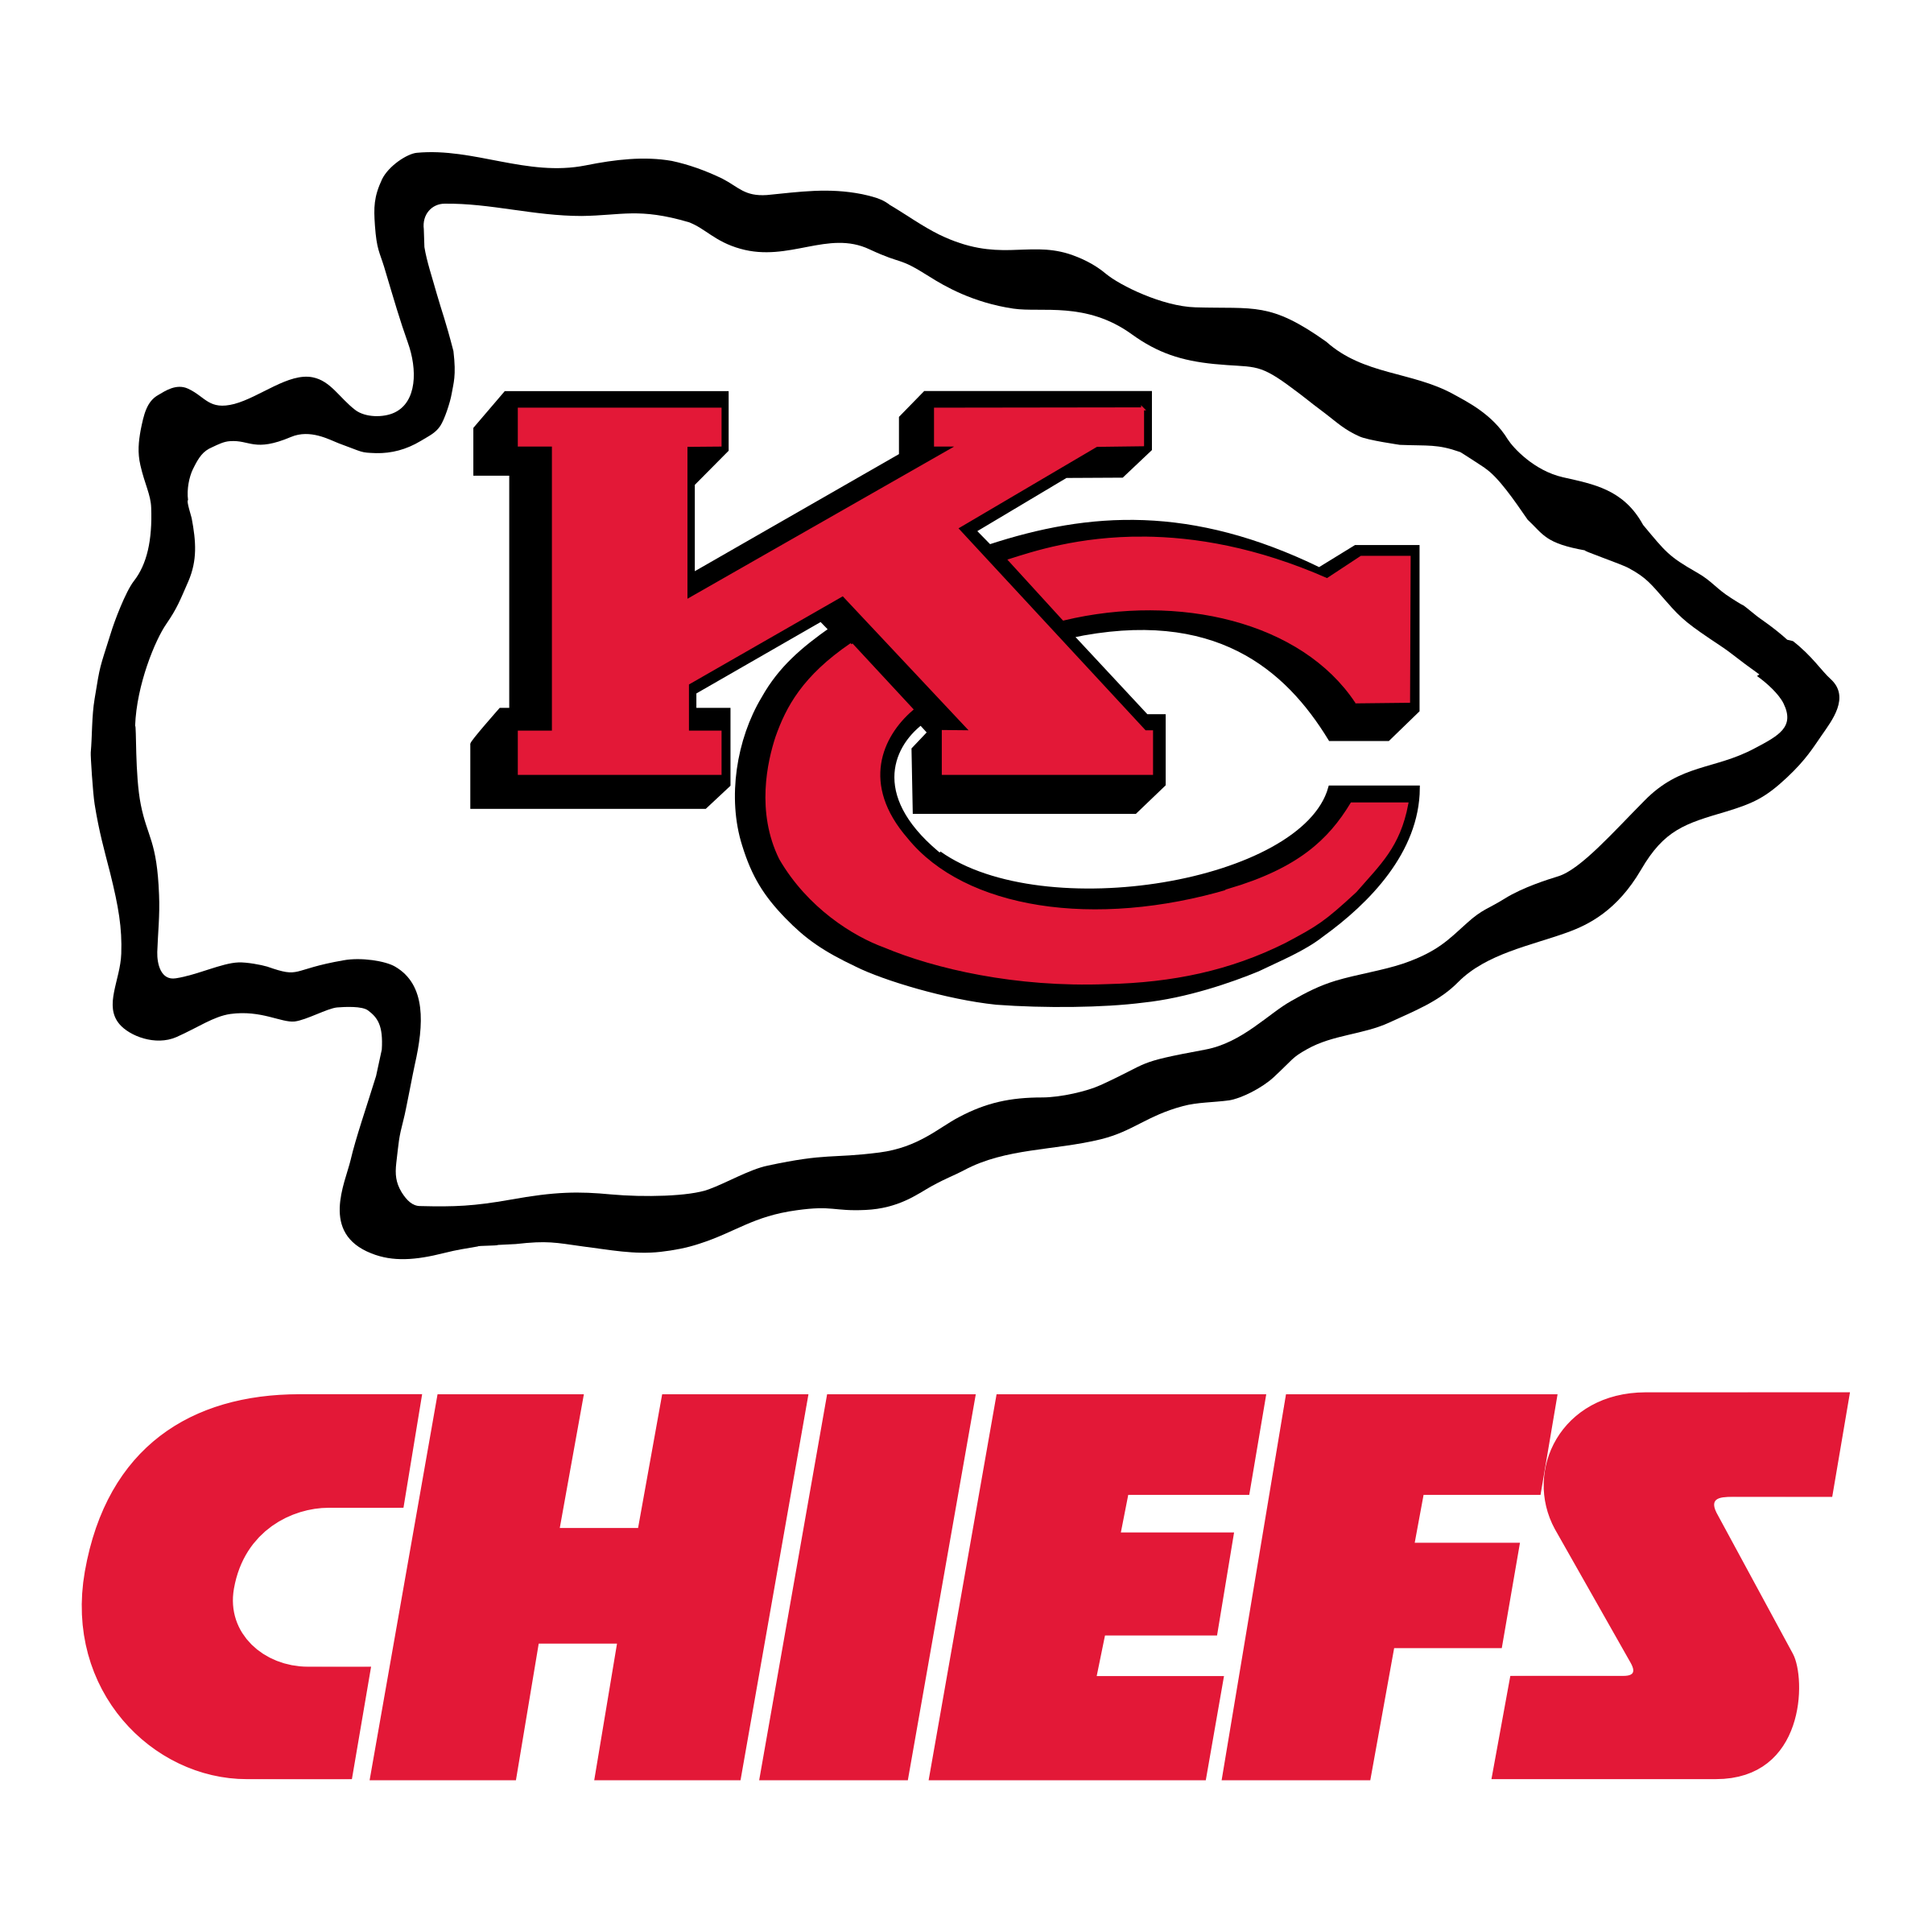 Kansas City Chiefs Football Logo - Kansas City Chiefs, Transparent background PNG HD thumbnail